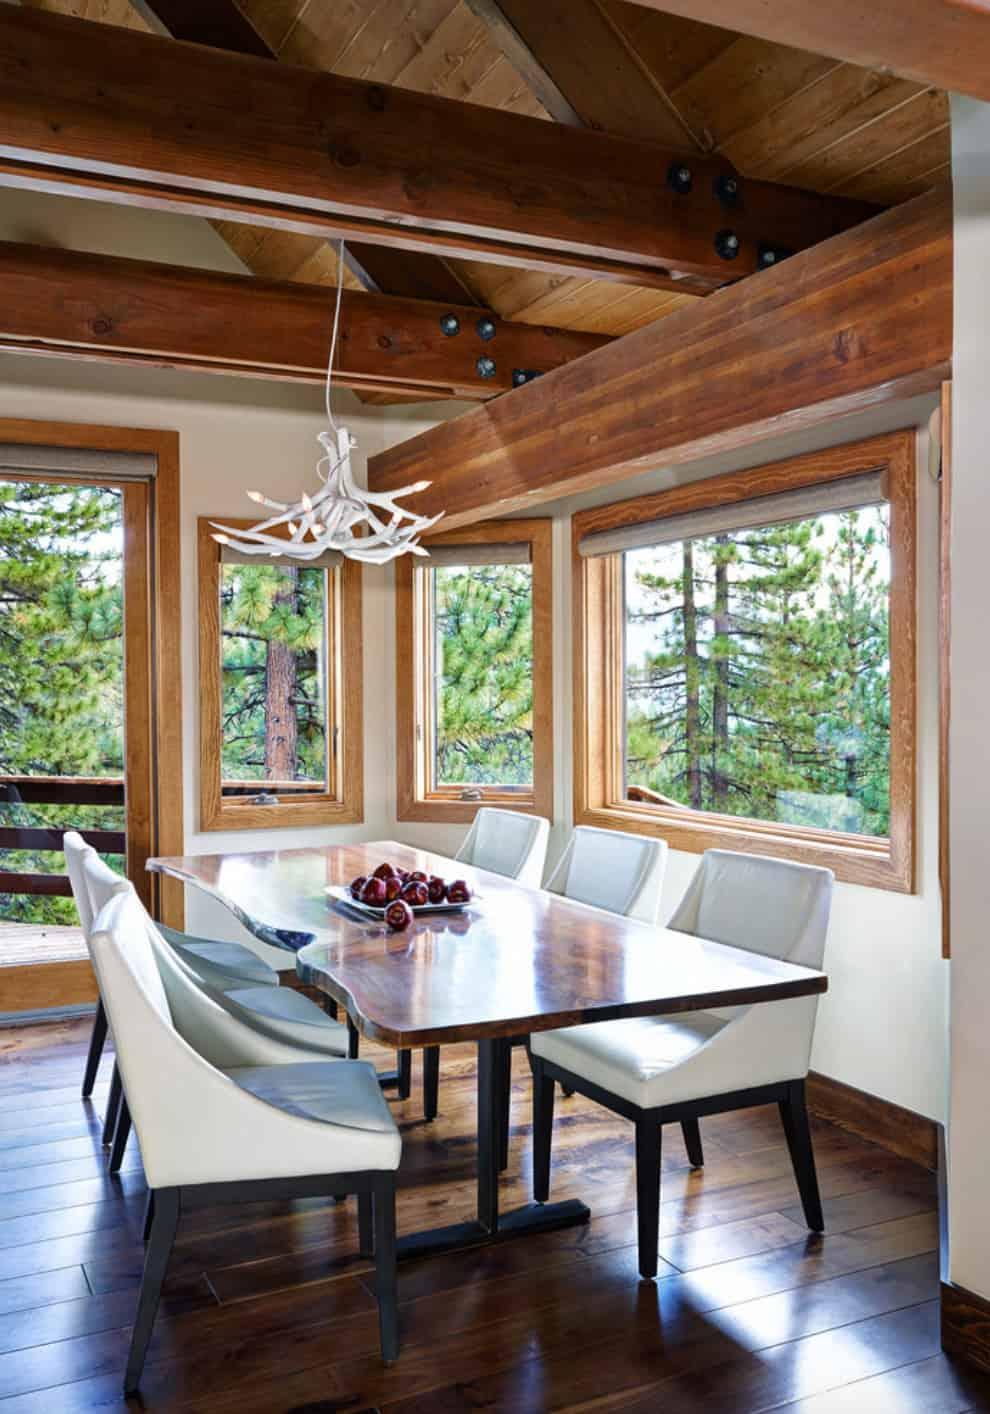 Rustic Mountain Retreat-Sierra Sustainable Builders-07-1 Kindesign